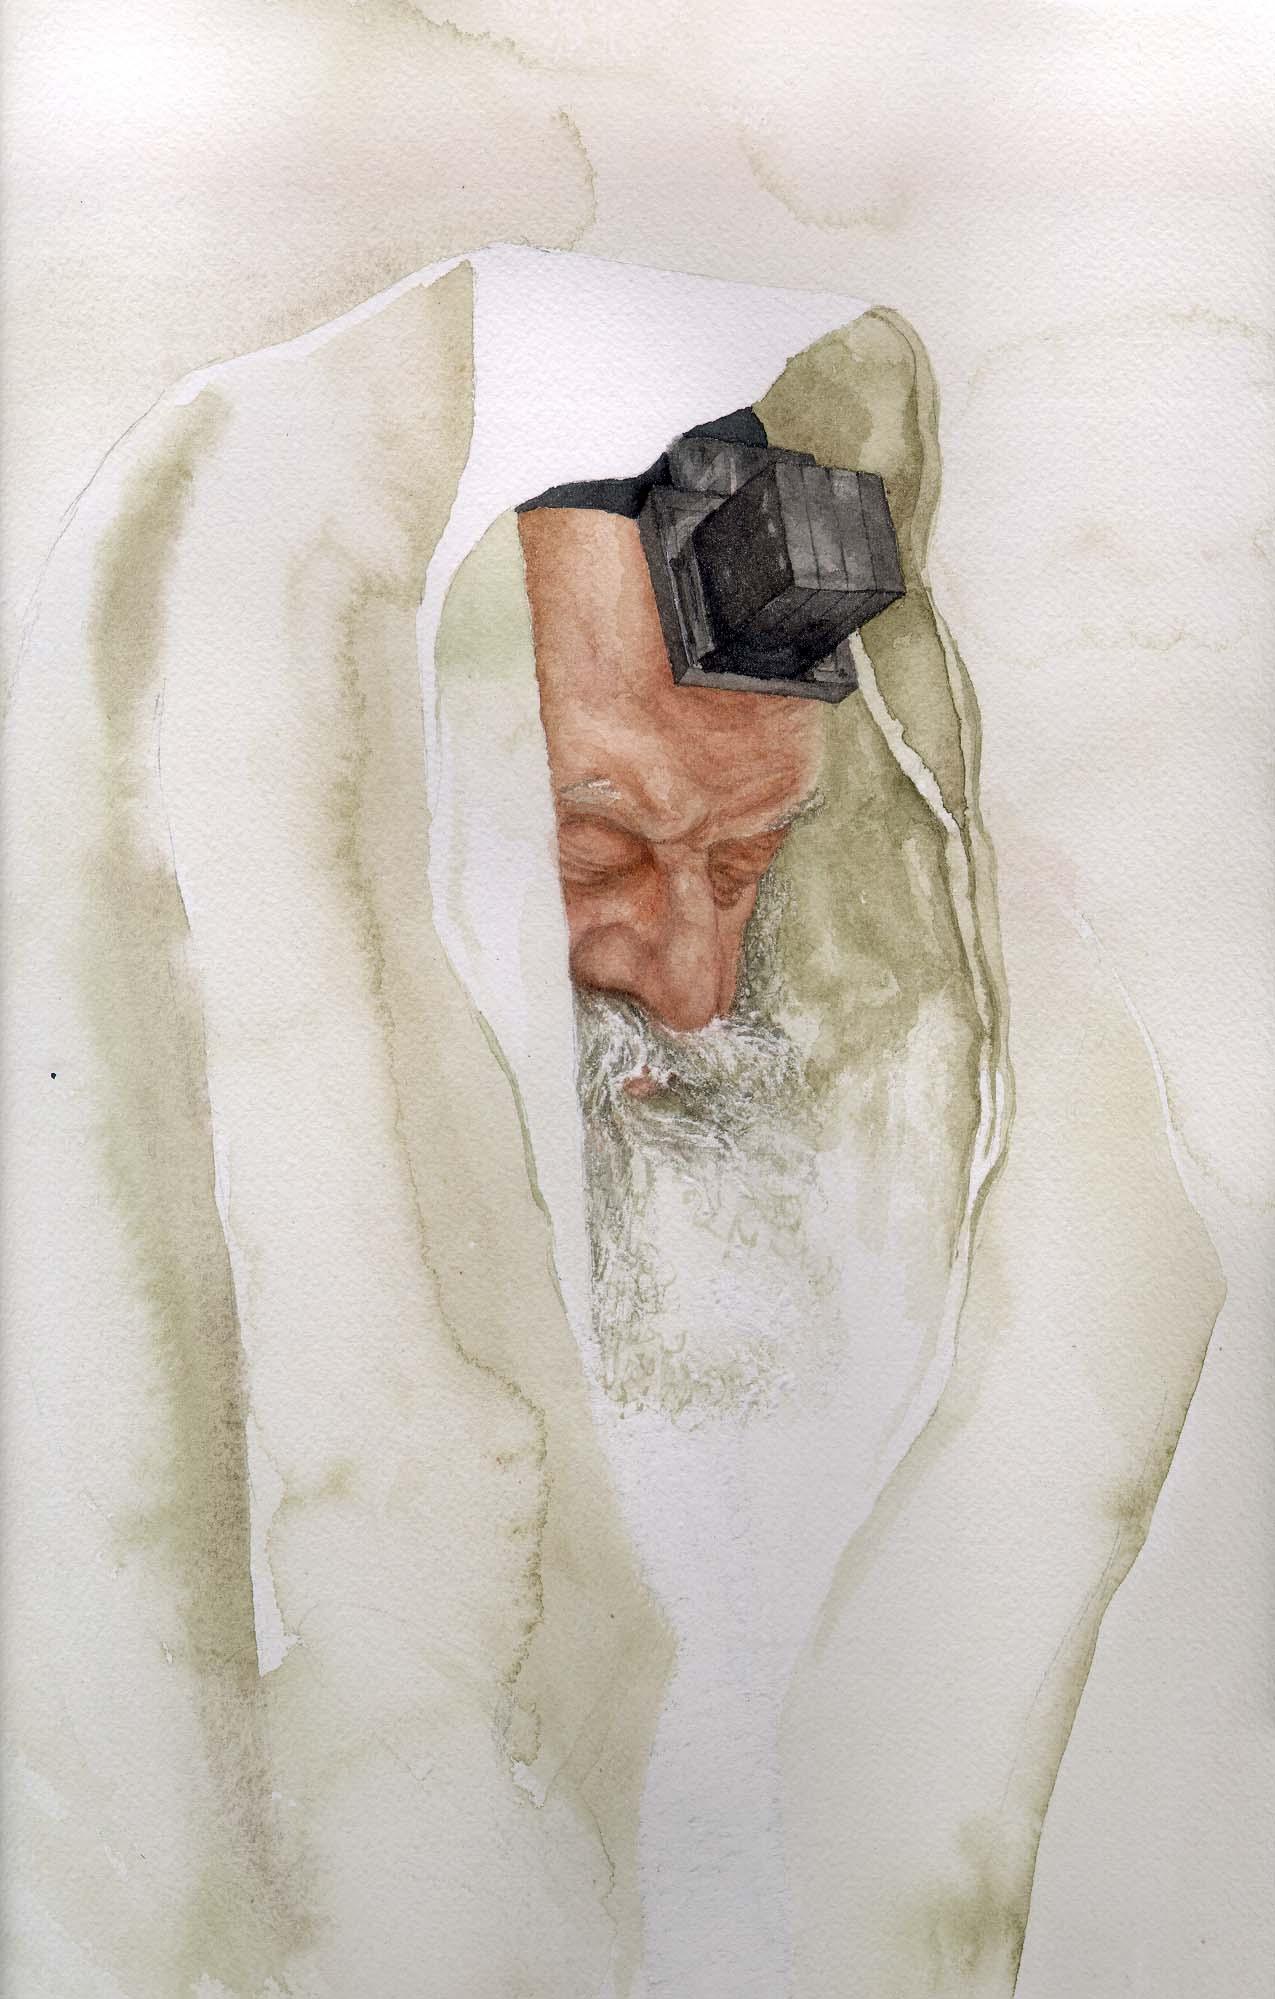 Rebbe in Watercolor